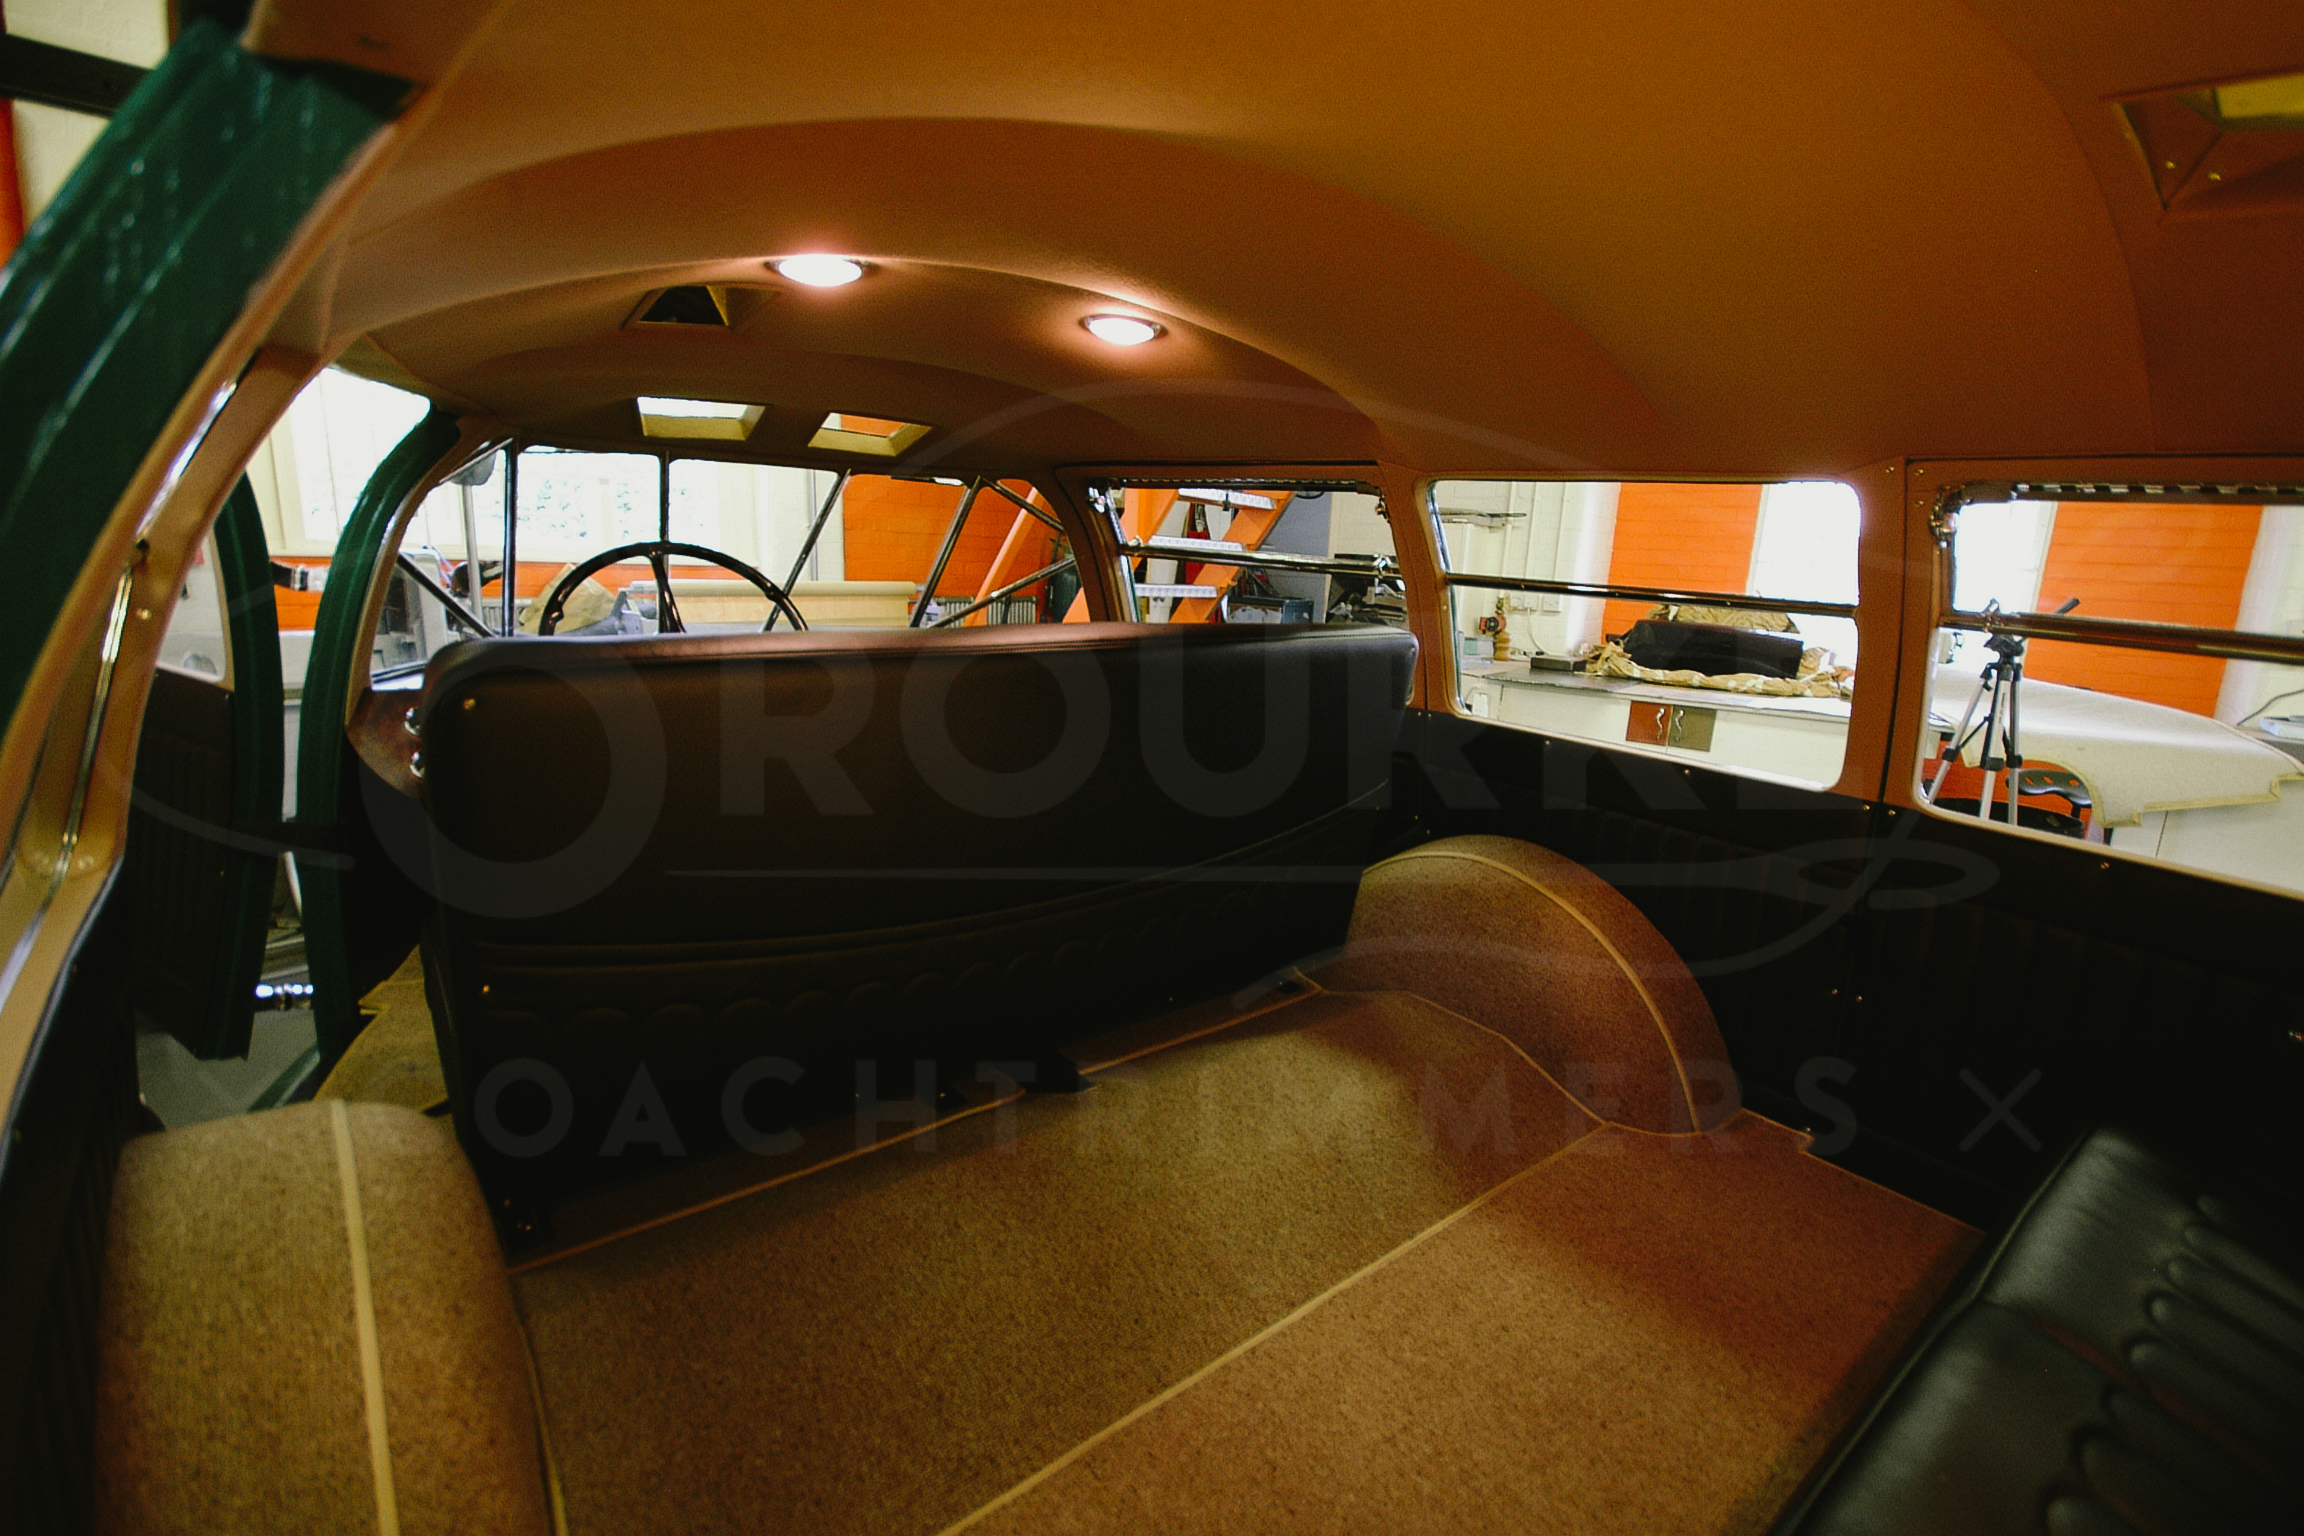 o-rourke-coachtrimmers-dymaxion-car-3-6.jpg